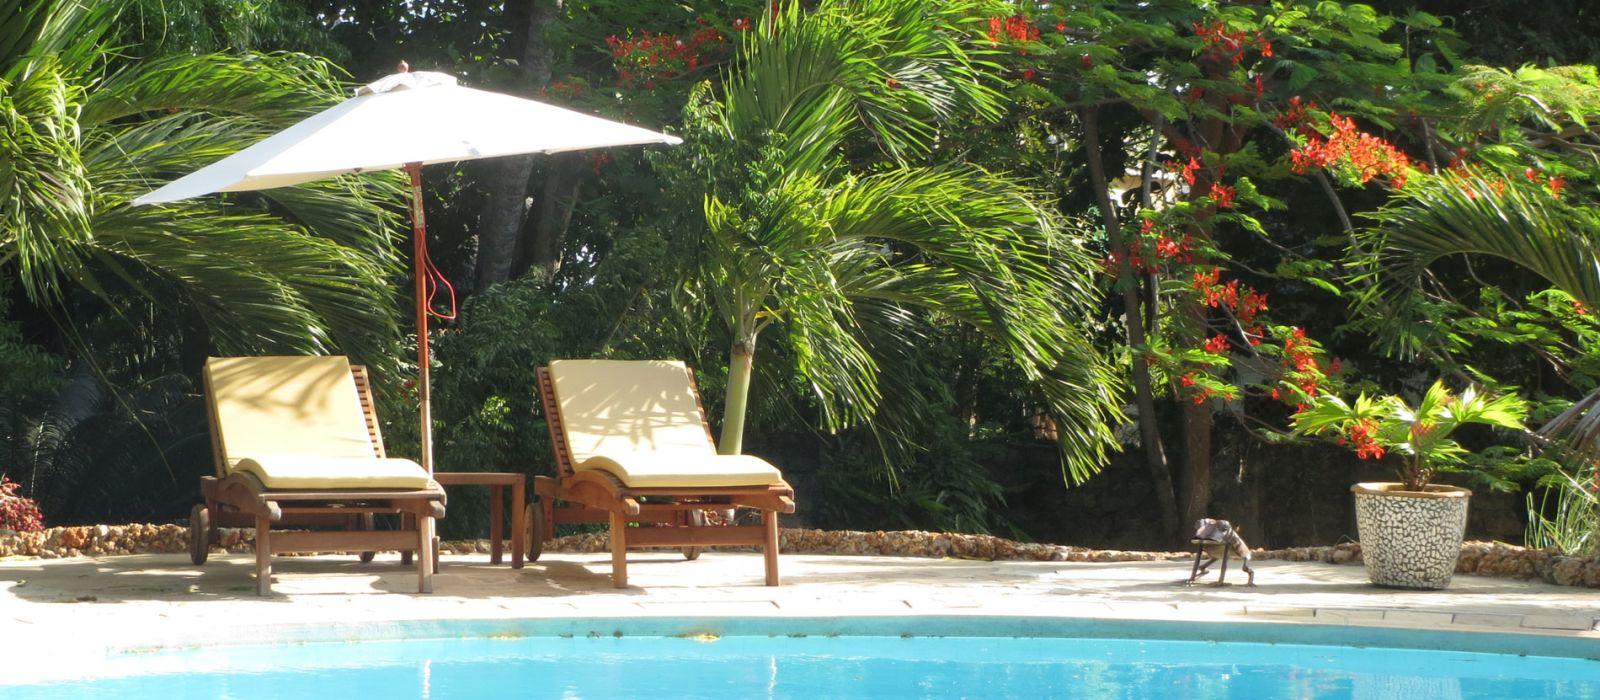 Hotel Mbuyu Bungalows Kenya